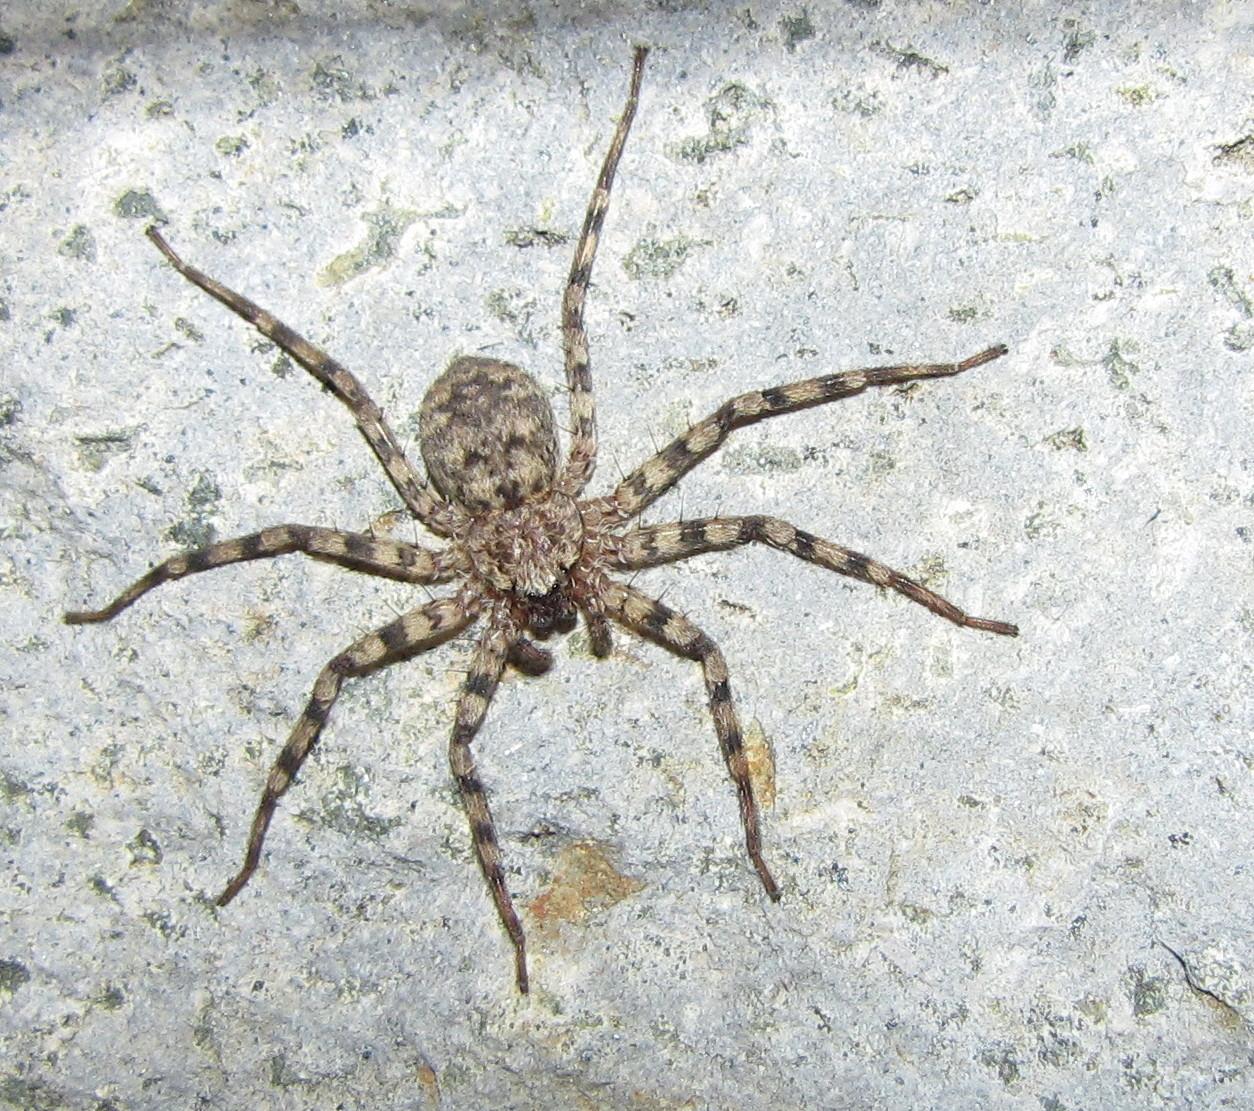 Bug Eric: Spider Sunday: Flatties